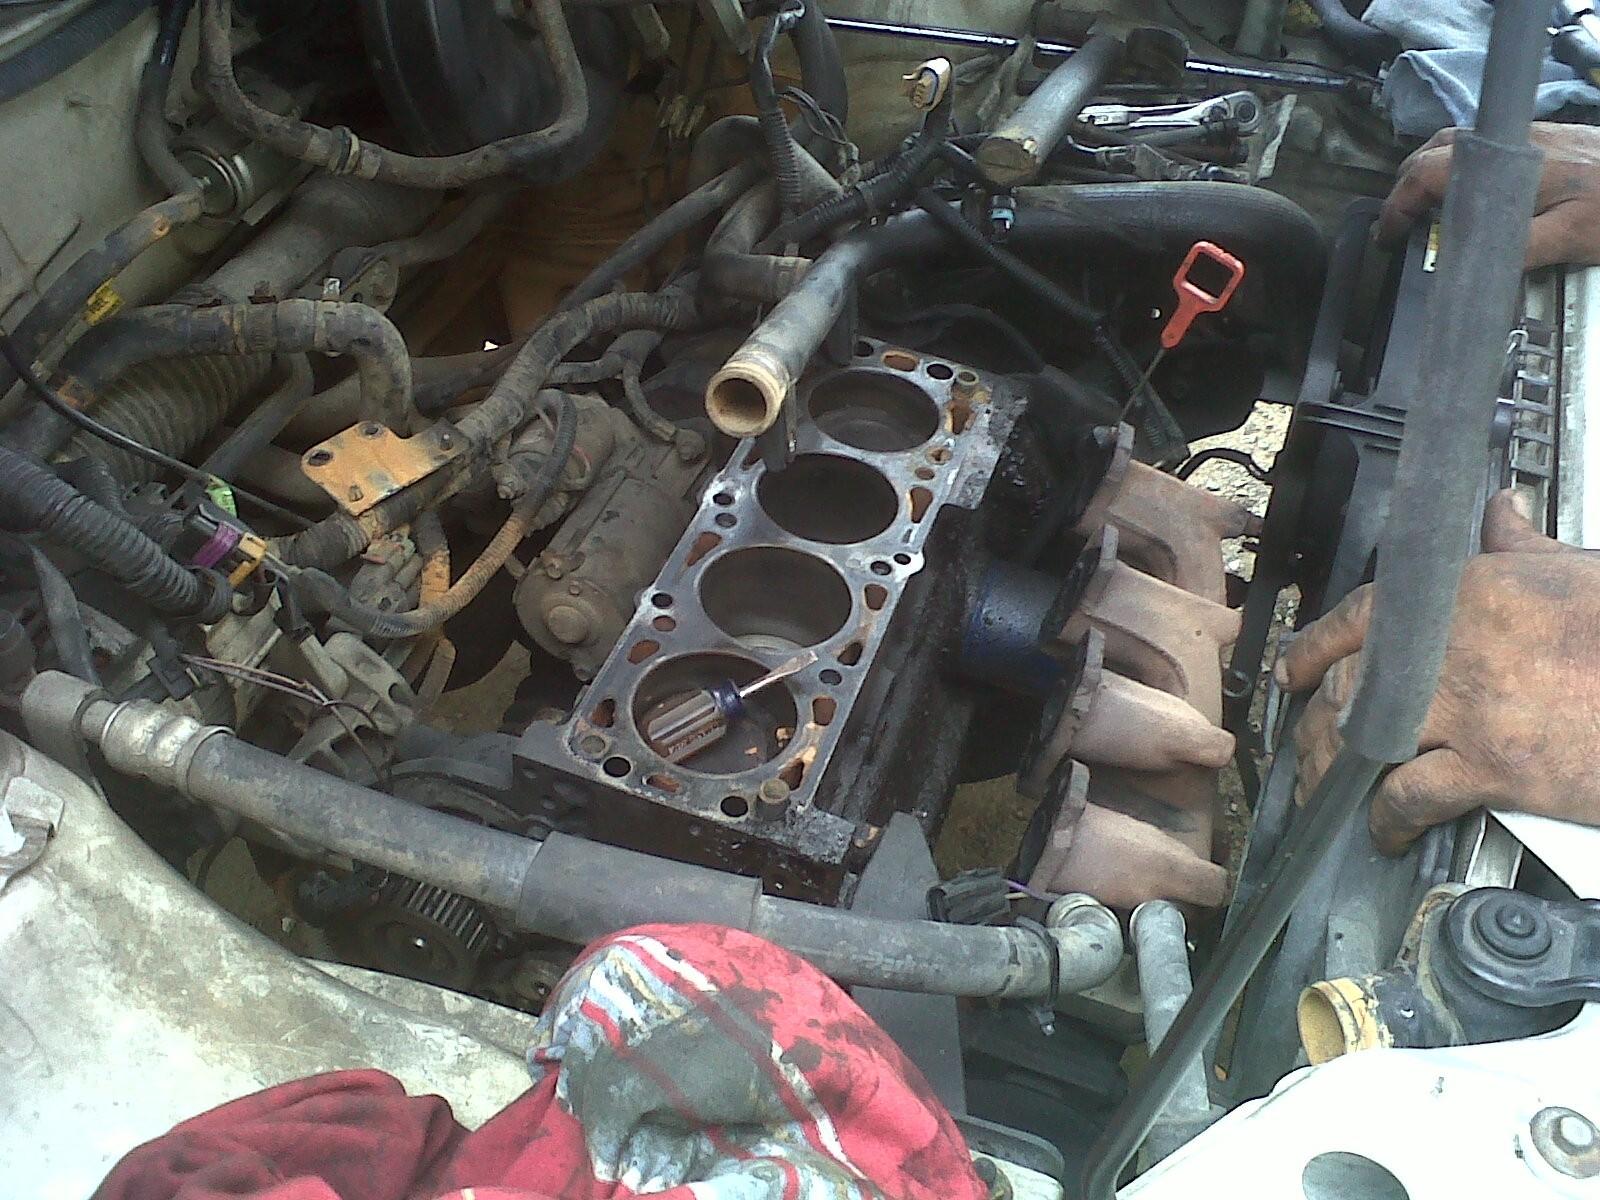 Daewoo Lanos Engine Diagram Sacova87 1999 Daewoo Lanoss Hatchback 2d Specs S Modification Of Daewoo Lanos Engine Diagram